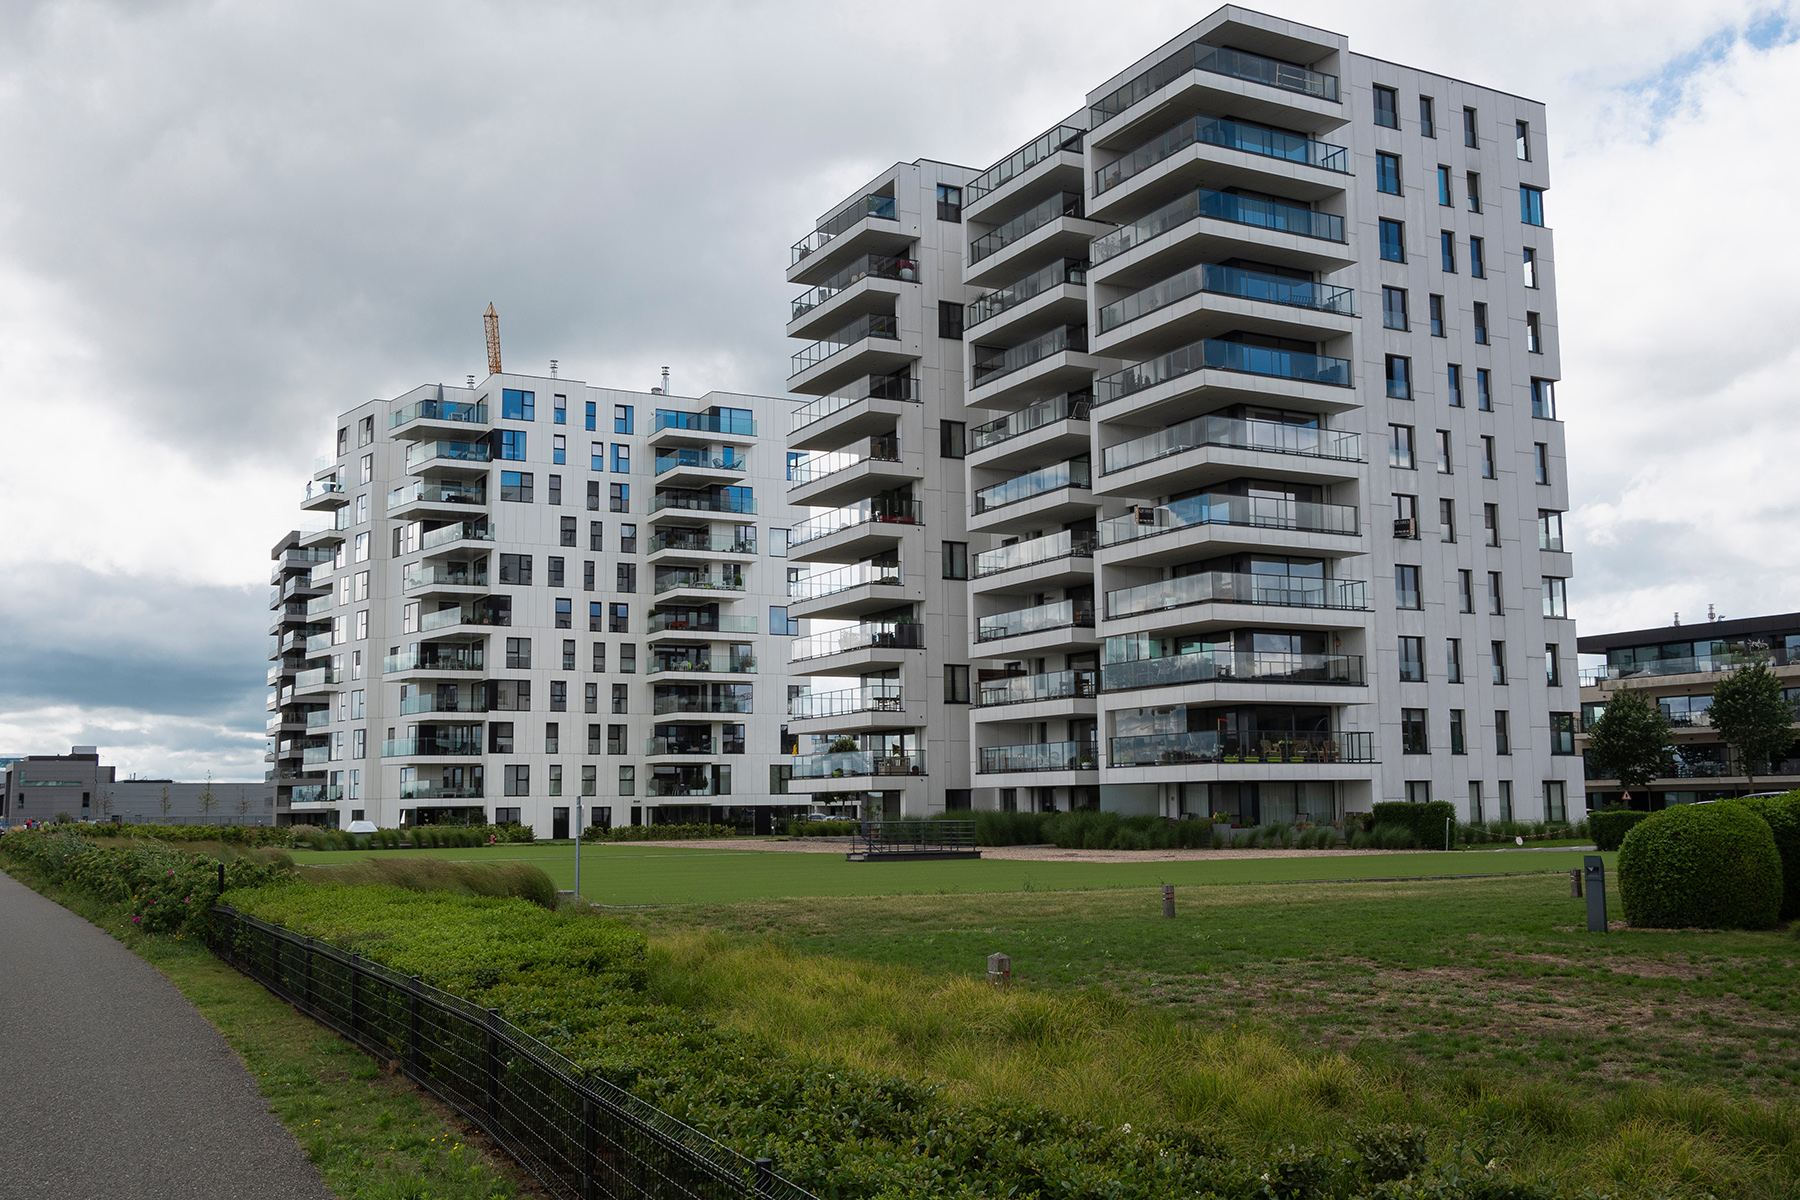 Modern apartments in Temse, Belgium